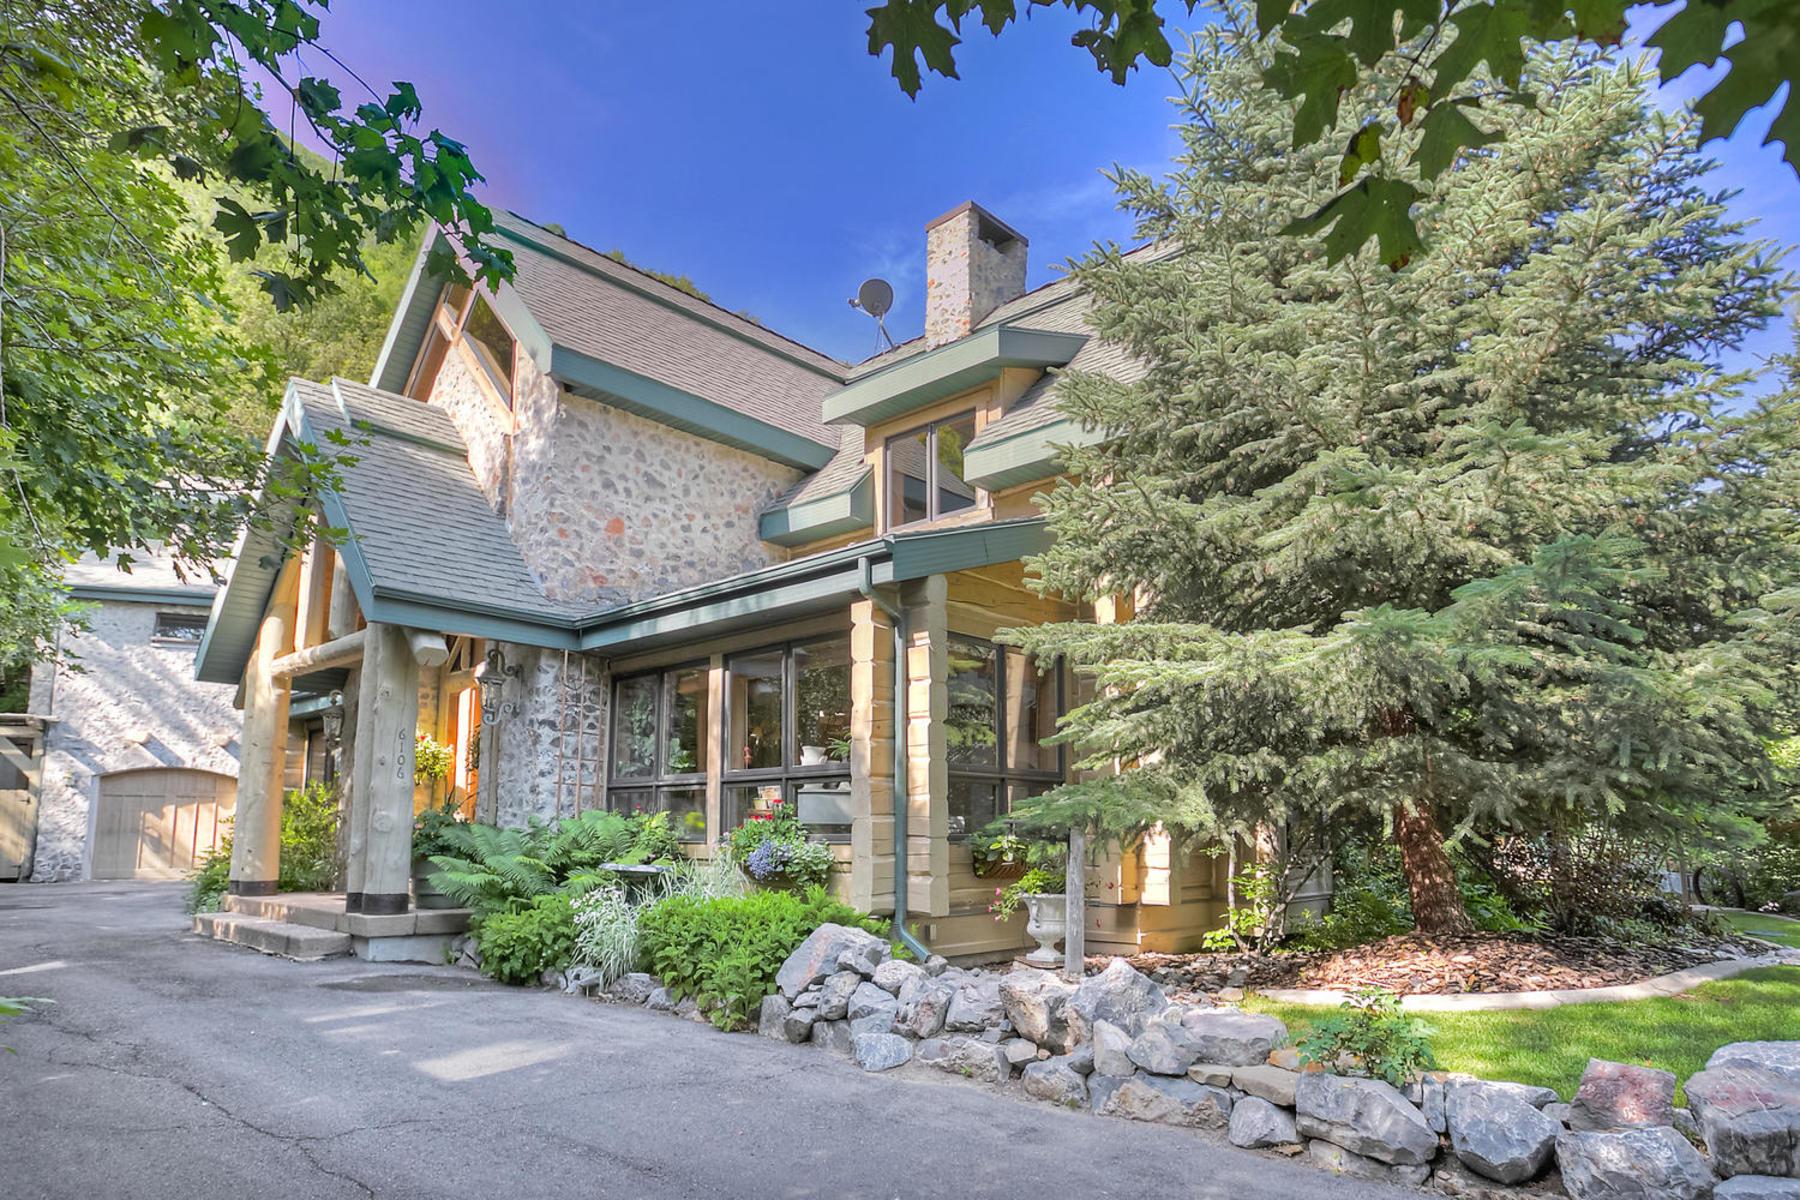 Casa Unifamiliar por un Venta en Gorgeous Log Home on the Hobble Creek Golf Course 6106 E Grindstone Dr Springville, Utah, 84663 Estados Unidos